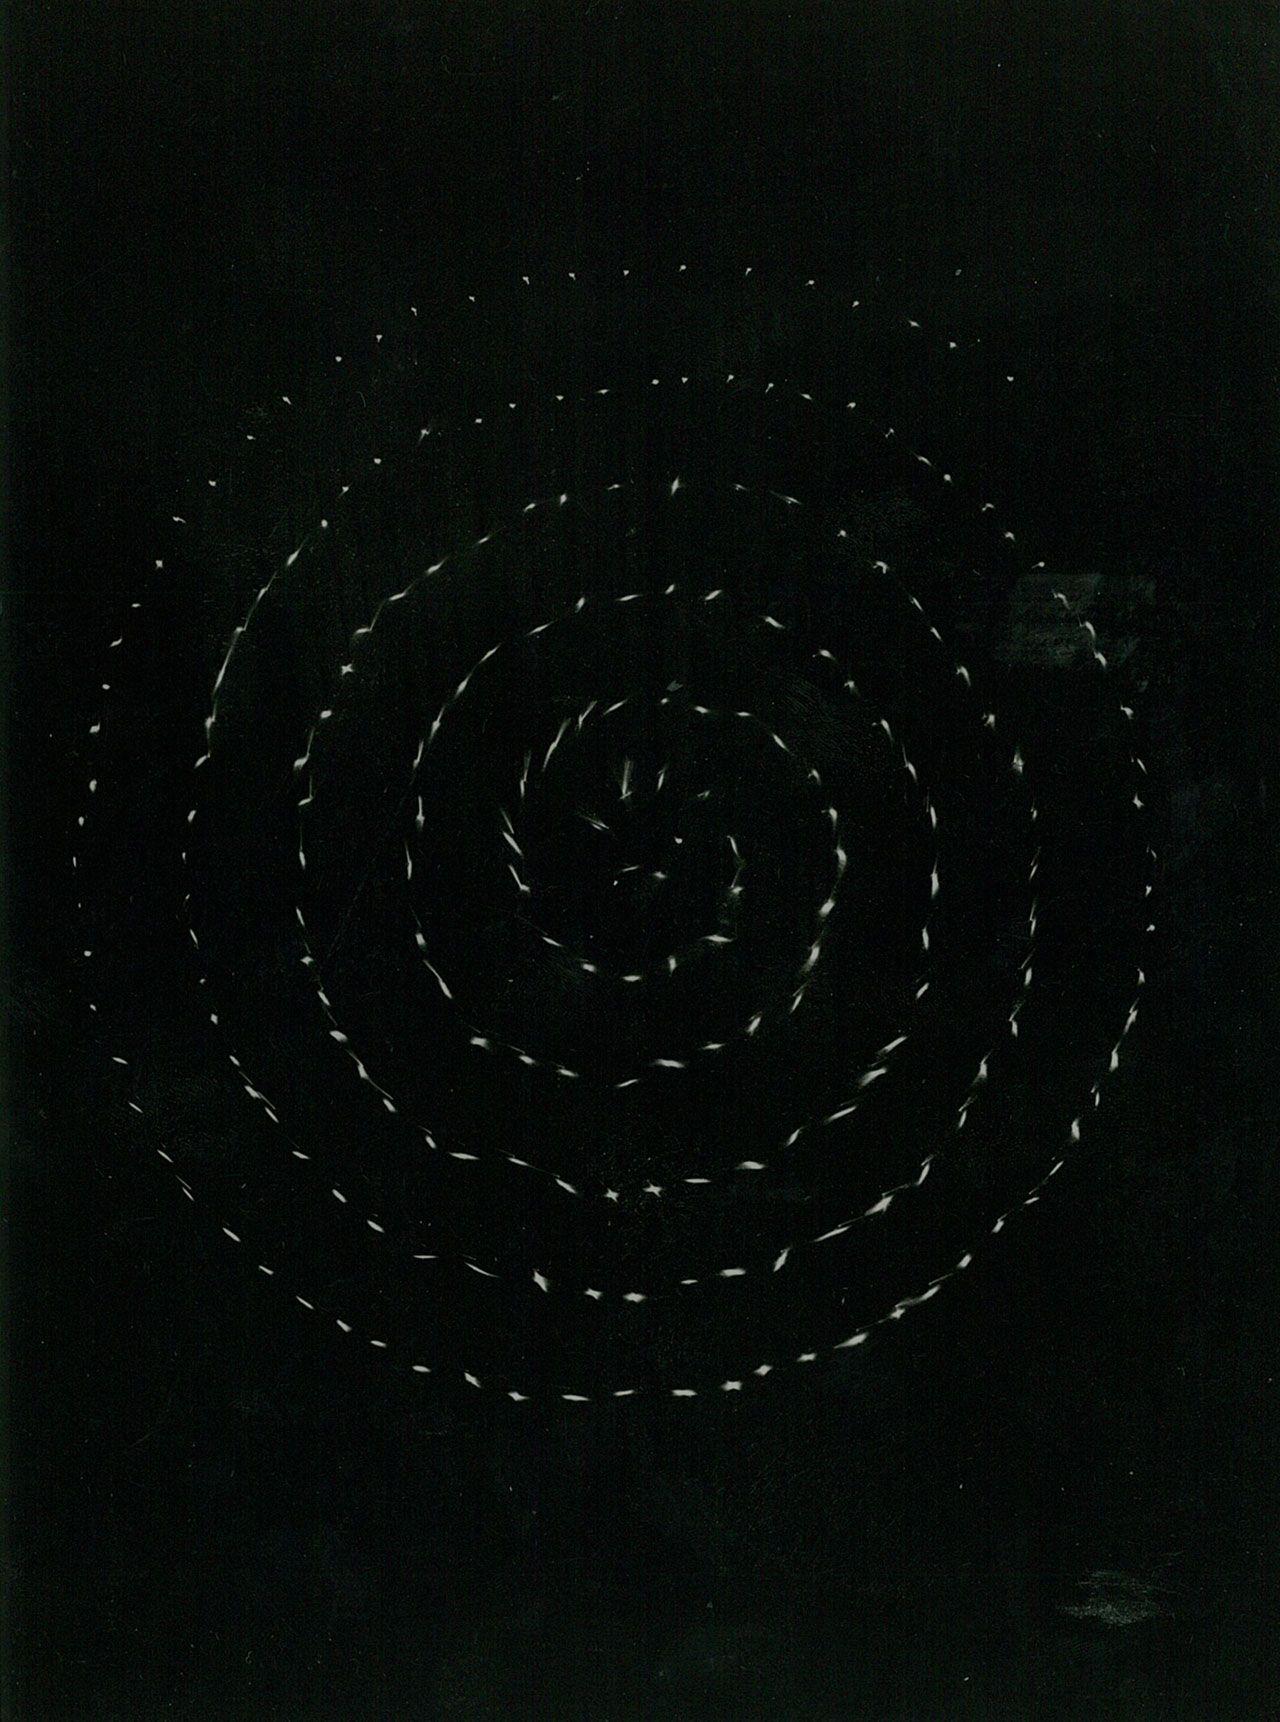 Gabriele Devecchi, Spiral and interactive version of Superficie in vibrazione exhibited during Miriorama 3, Galleria Pater, Milano, January 29 – Febryary 7, 1960